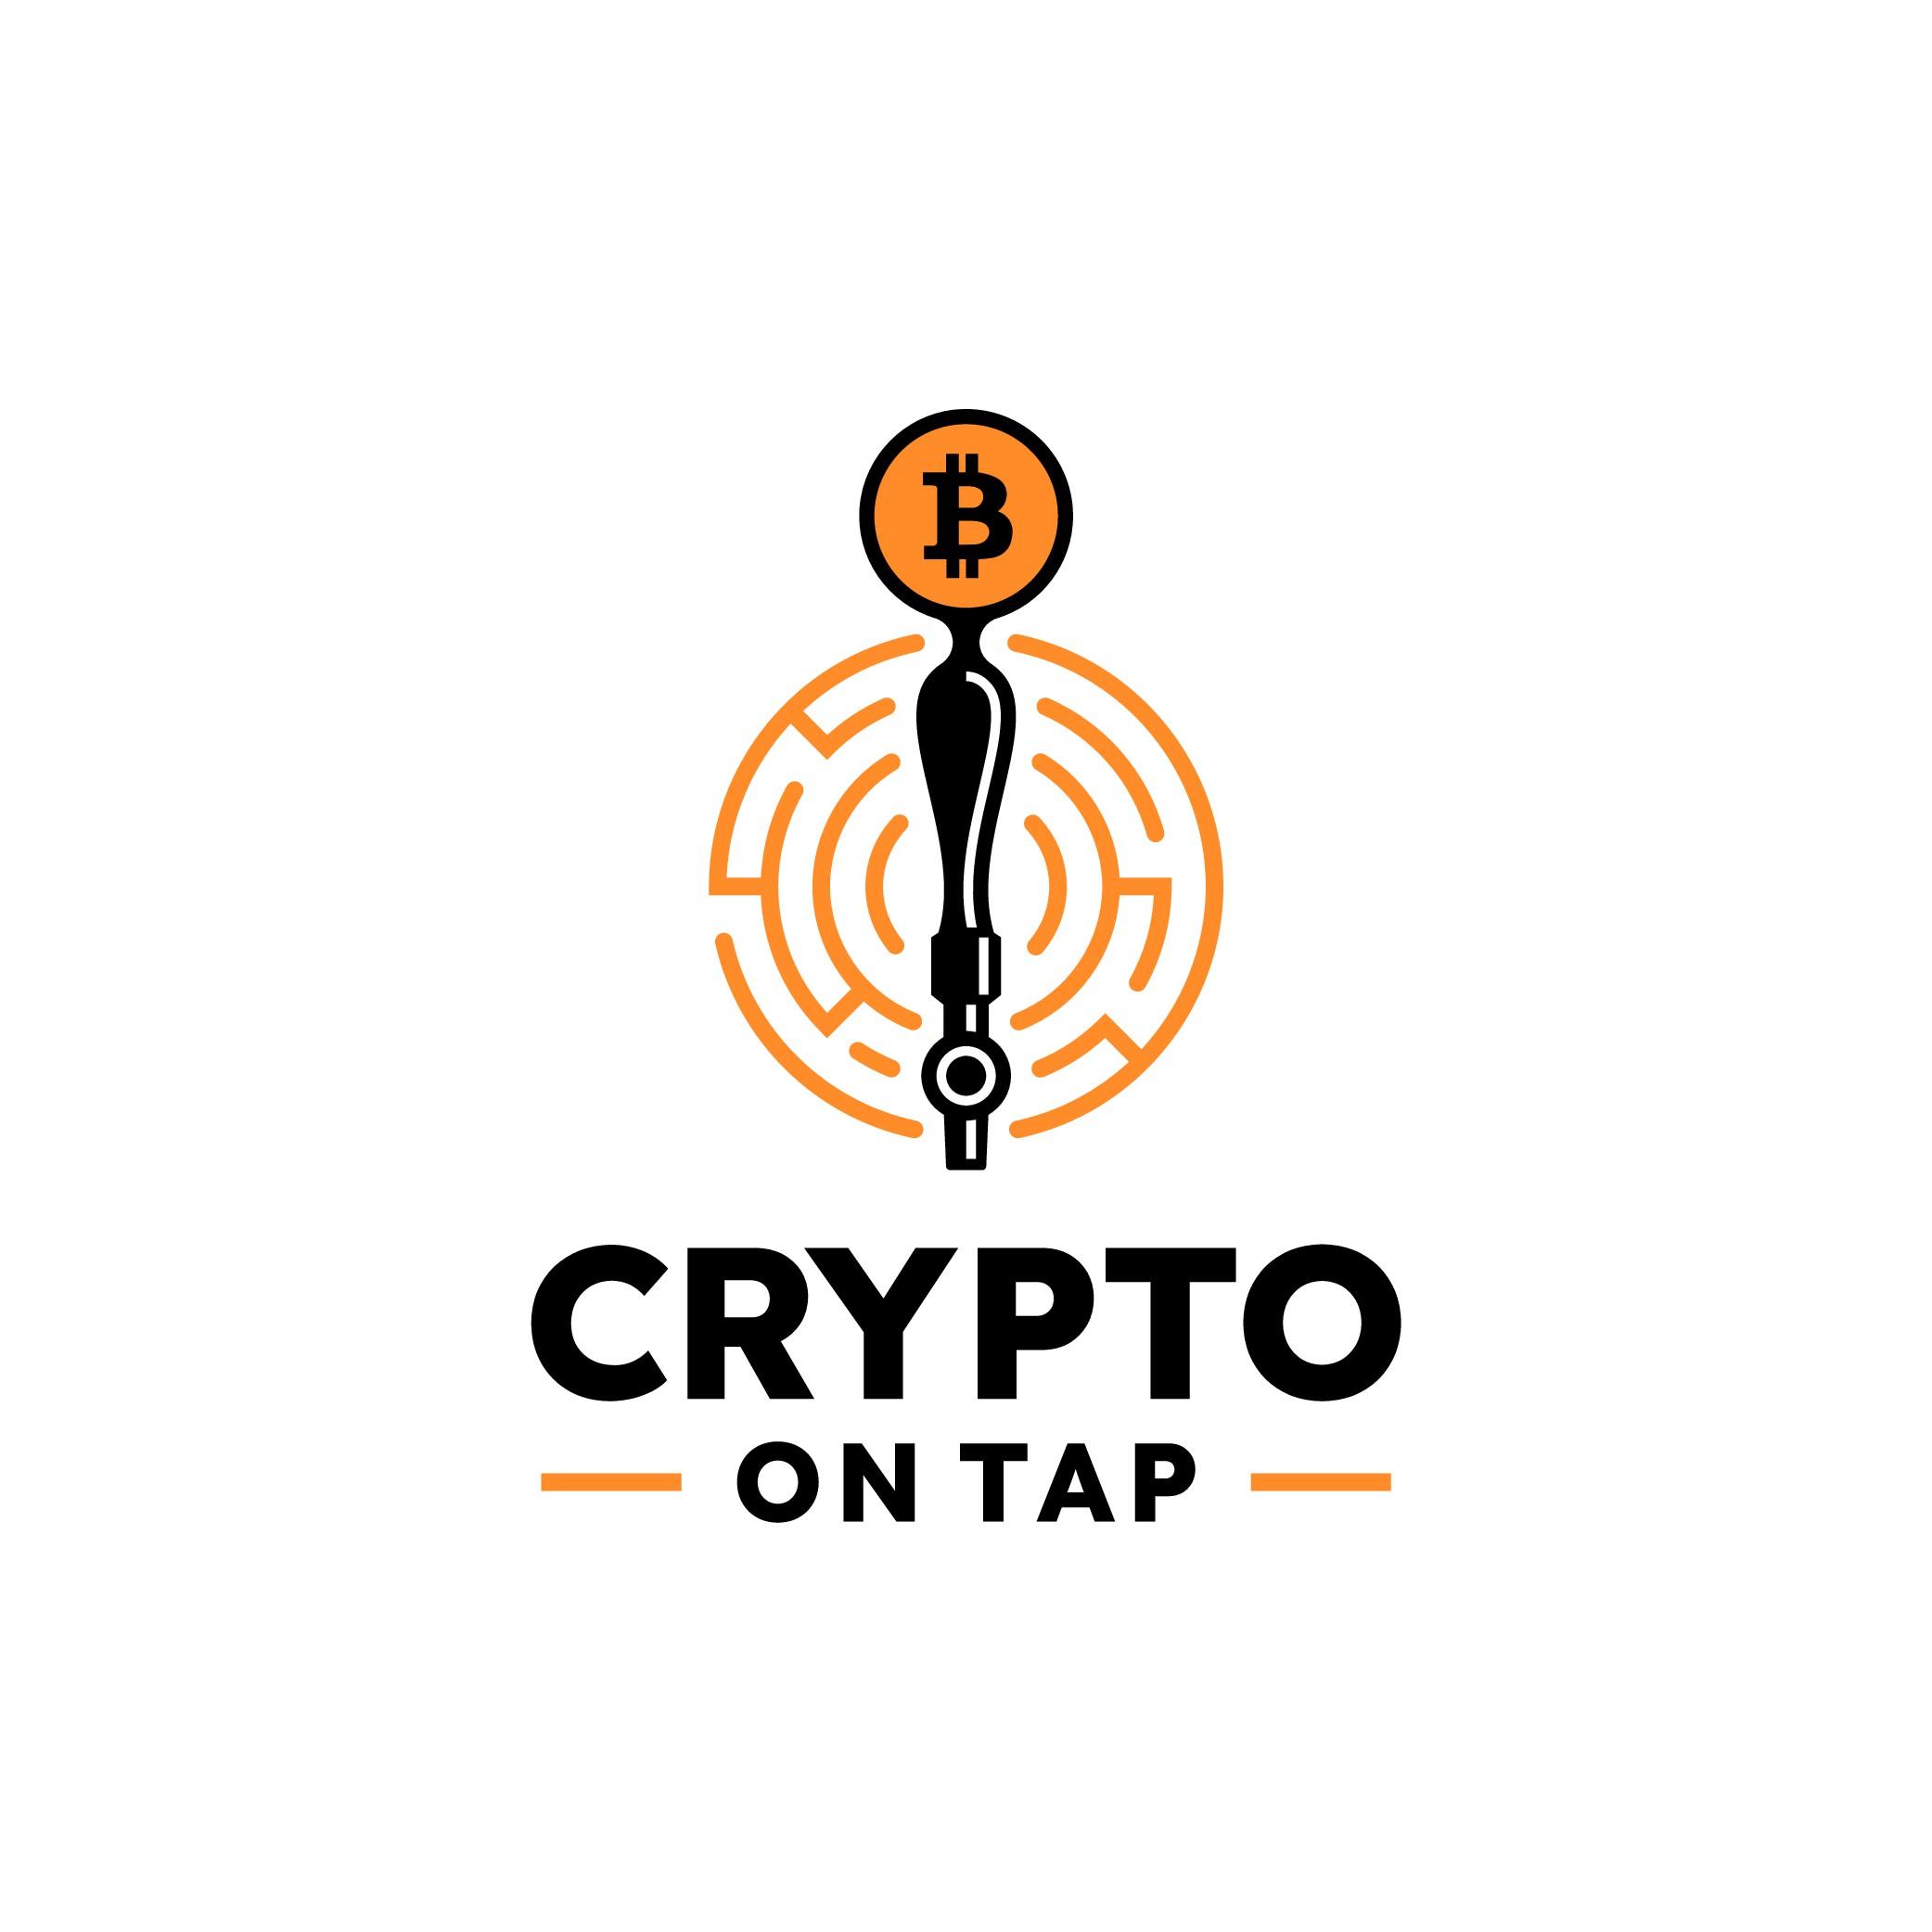 Crypto On Tap - Merge the futuristic crypto vibe with a warm inviting pub logo